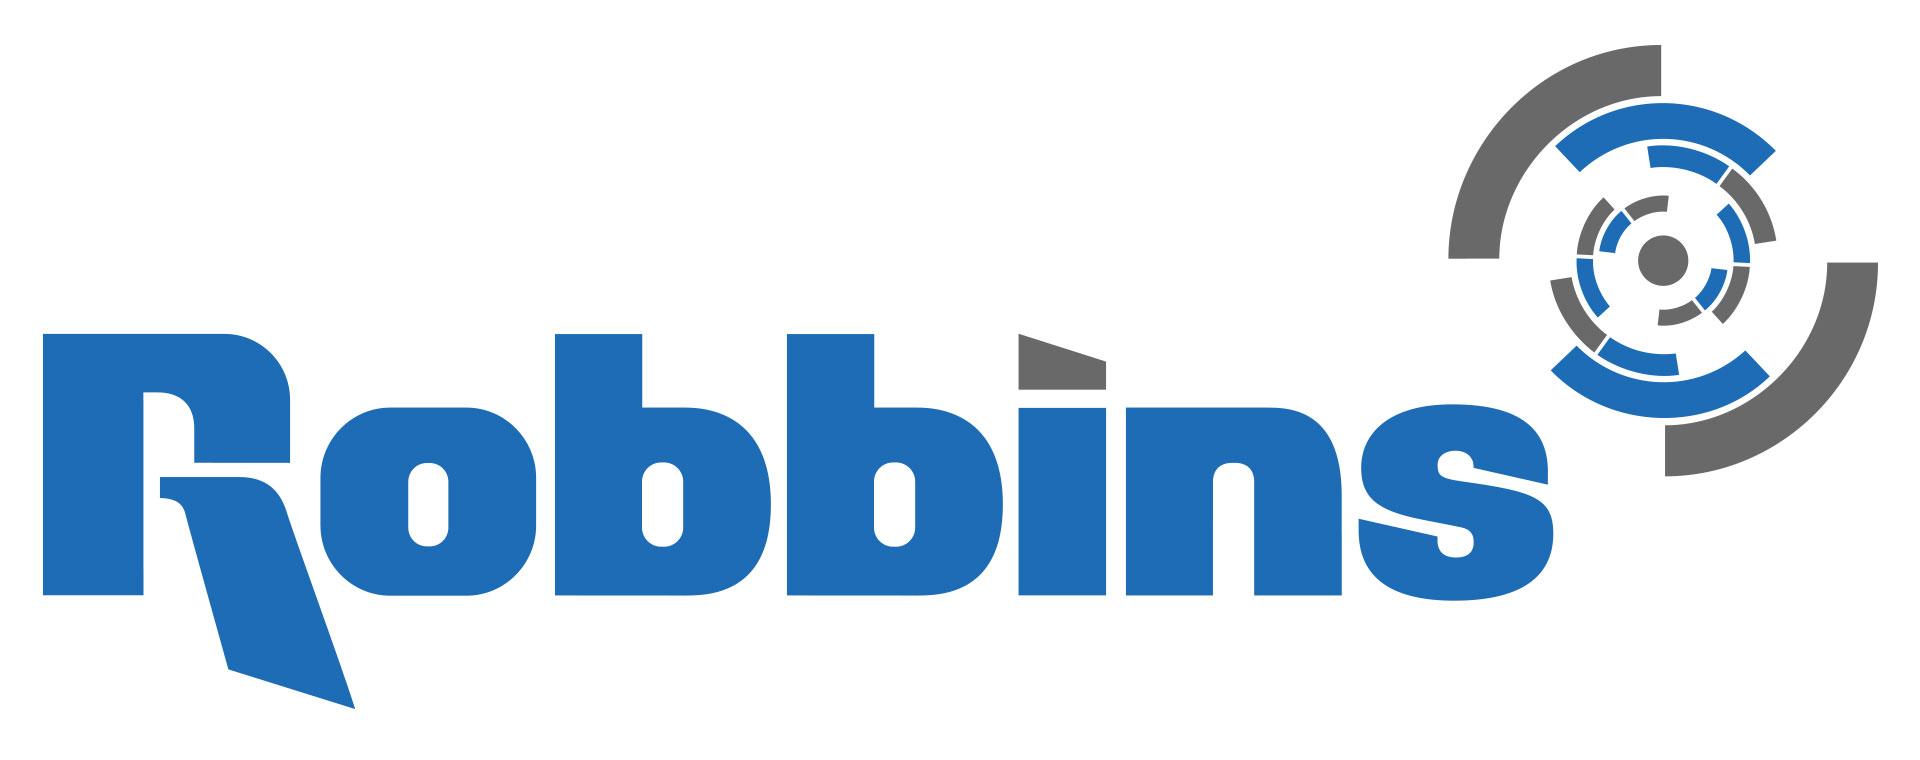 robbins_logo